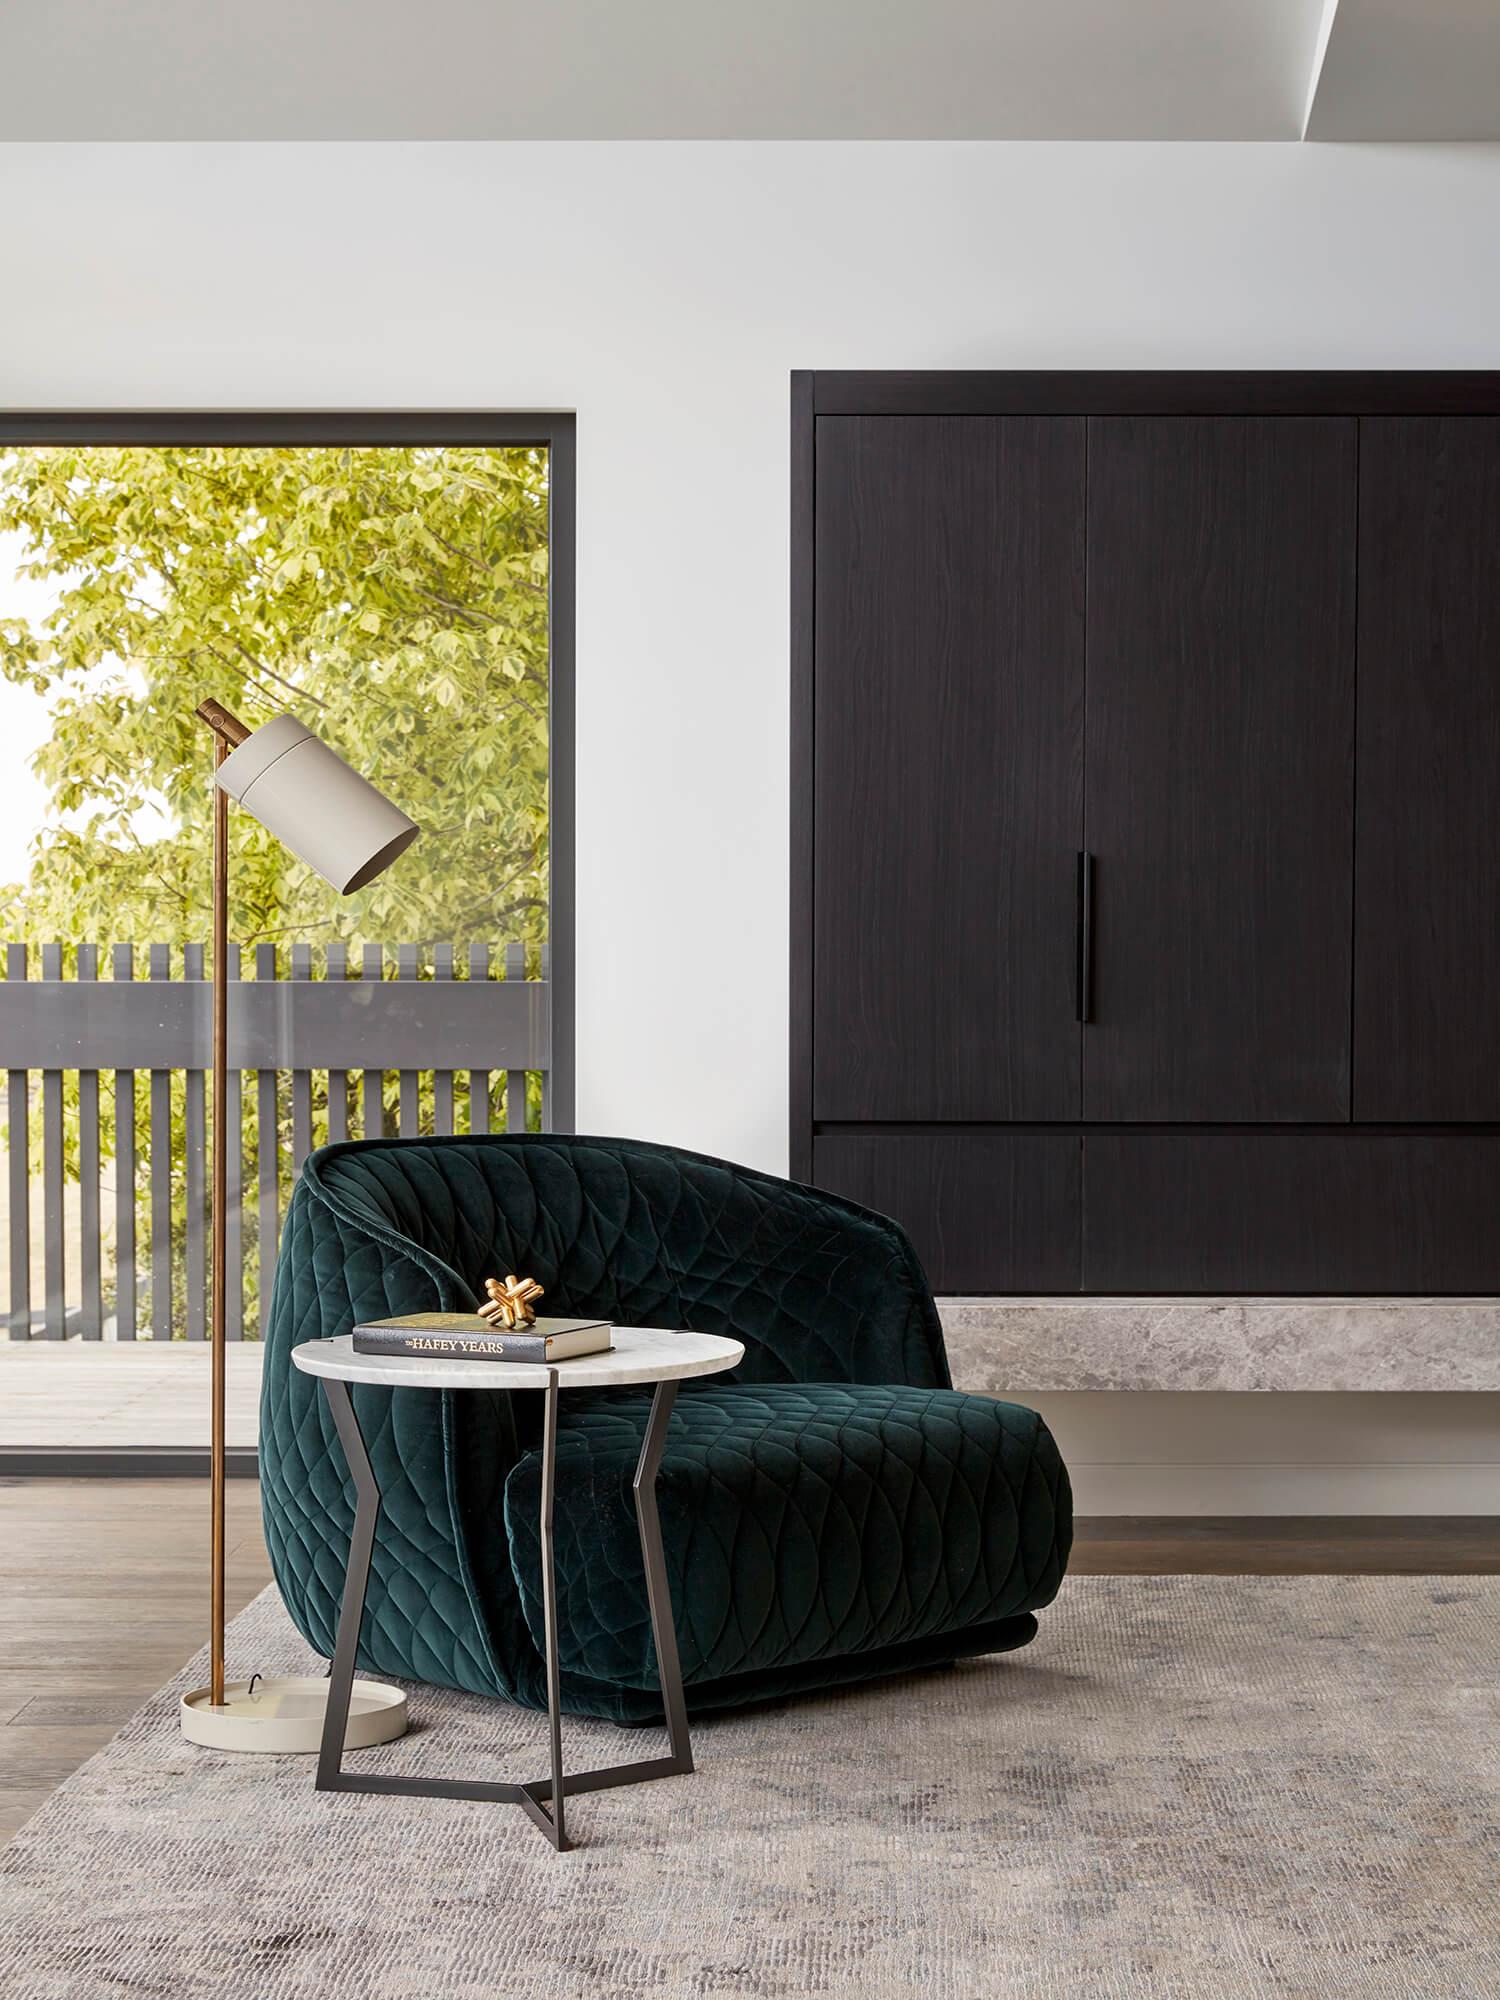 est living interiors Ceres Gable House Tecture 14